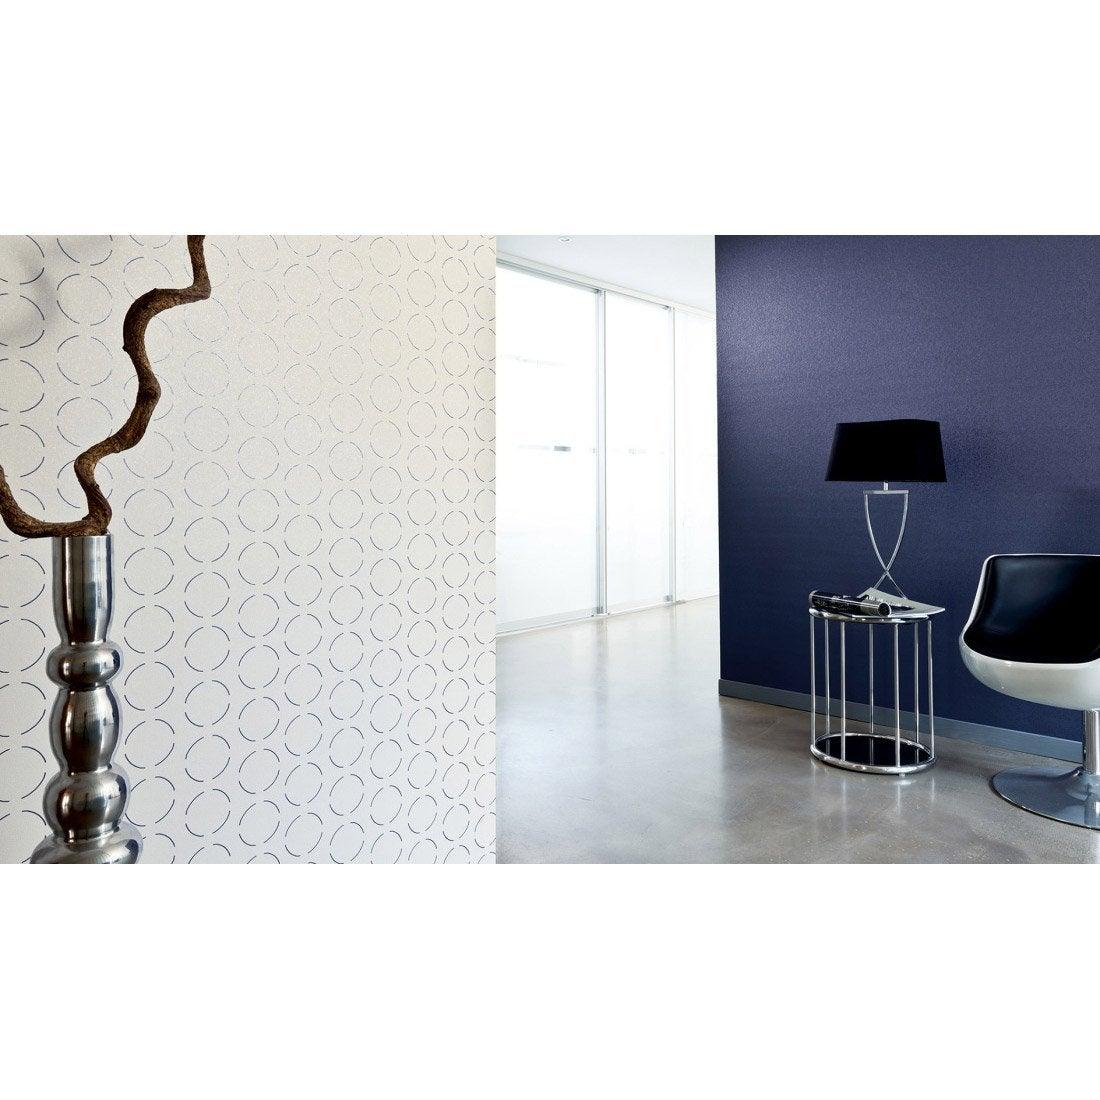 papier peint g om trique blanc violet intiss ap 2000 leroy merlin. Black Bedroom Furniture Sets. Home Design Ideas